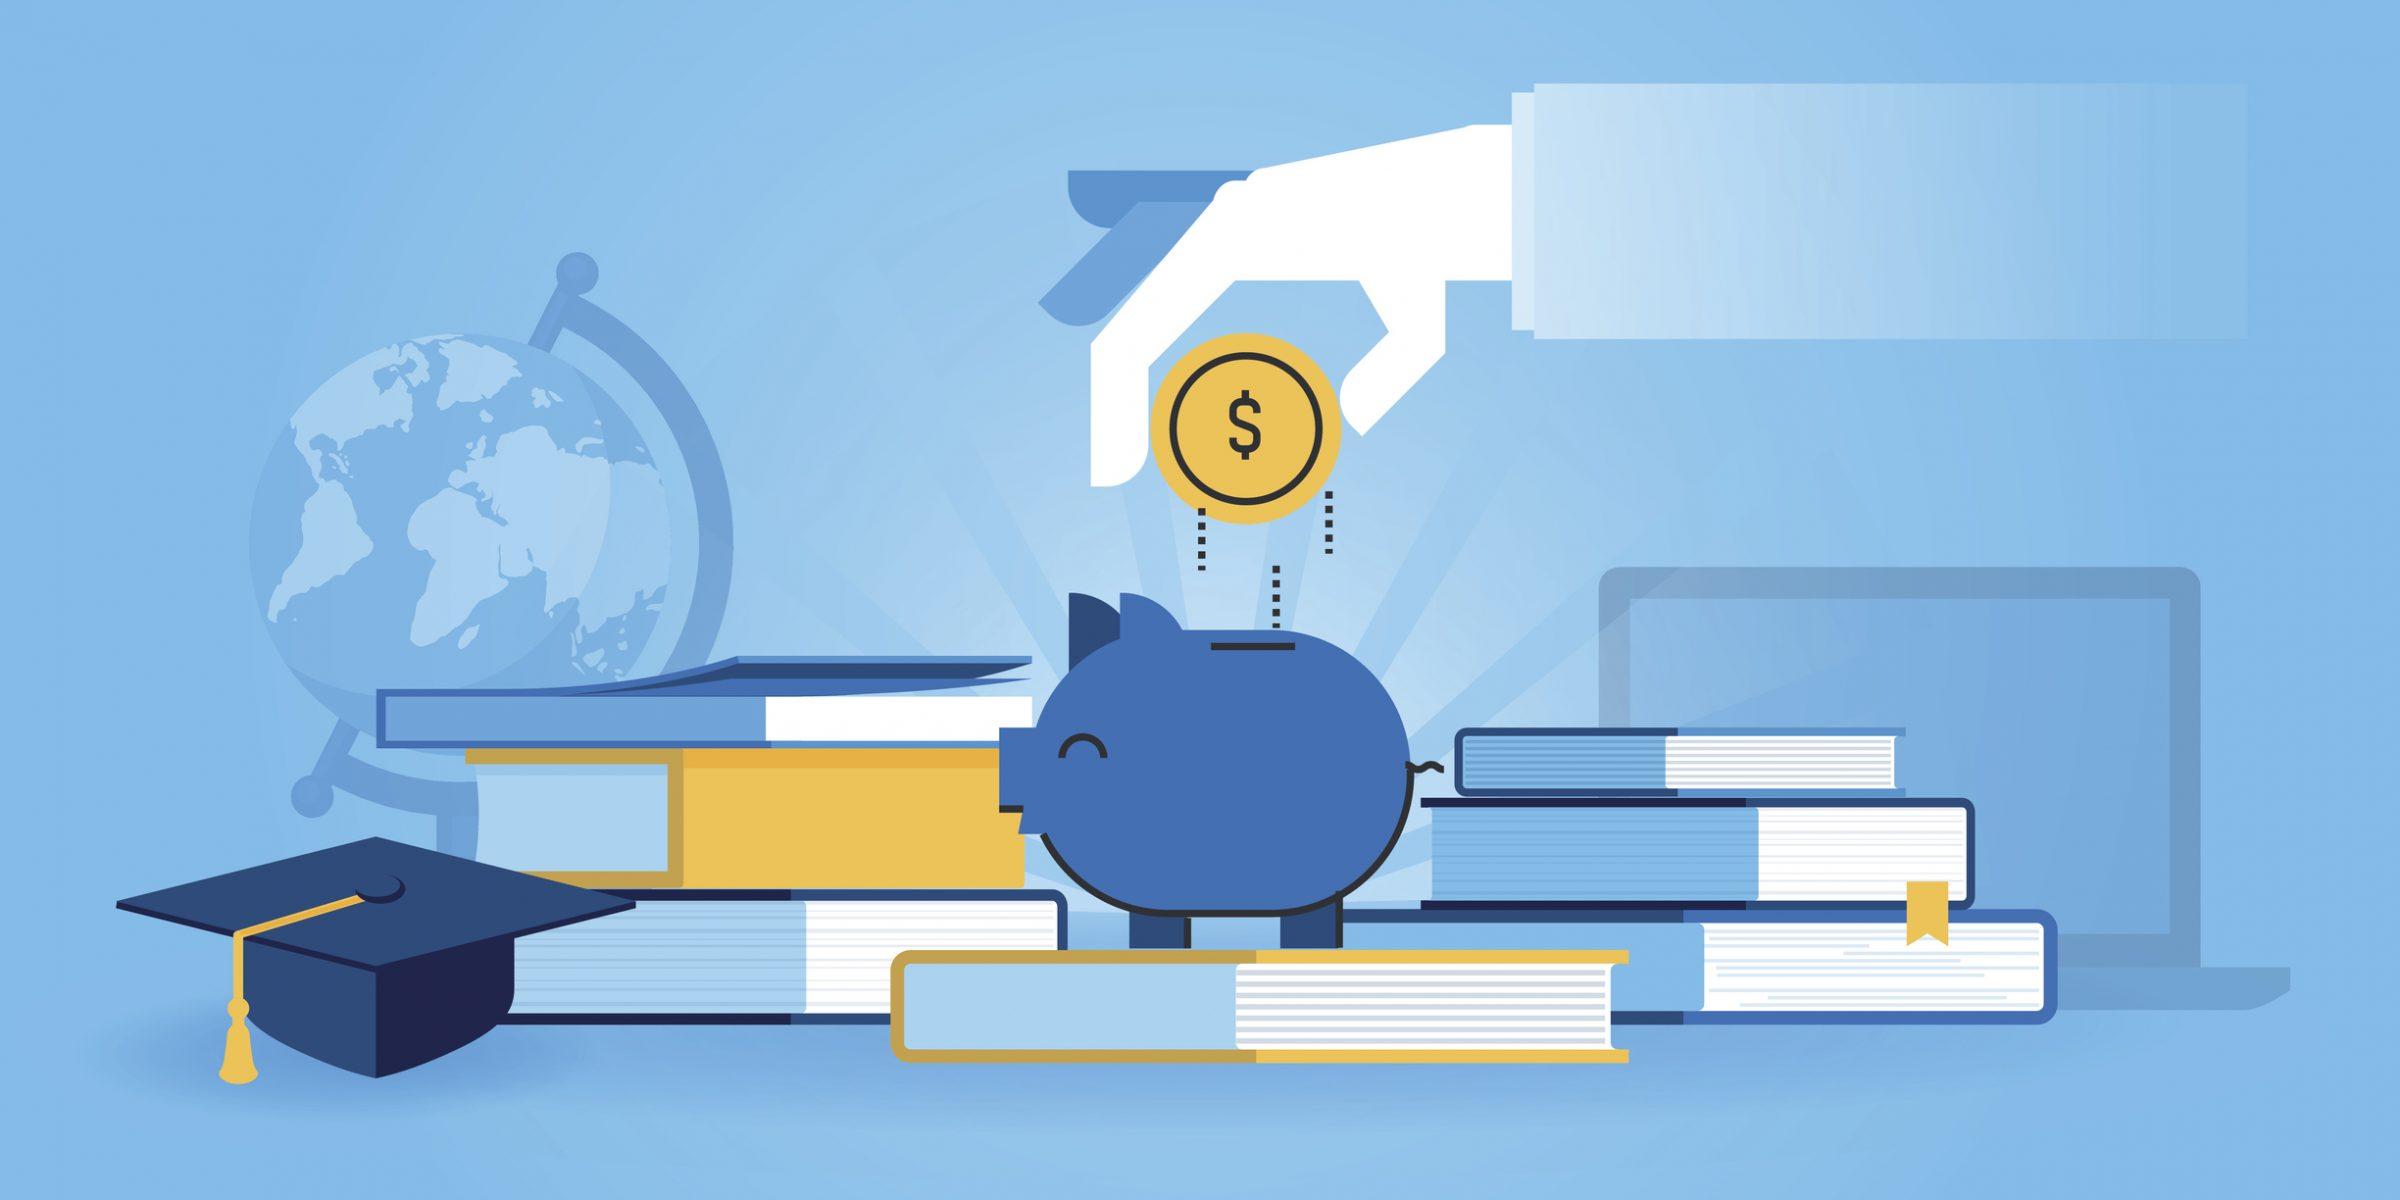 student-loan-program-tuition-reimbursement-educational-assistance_image